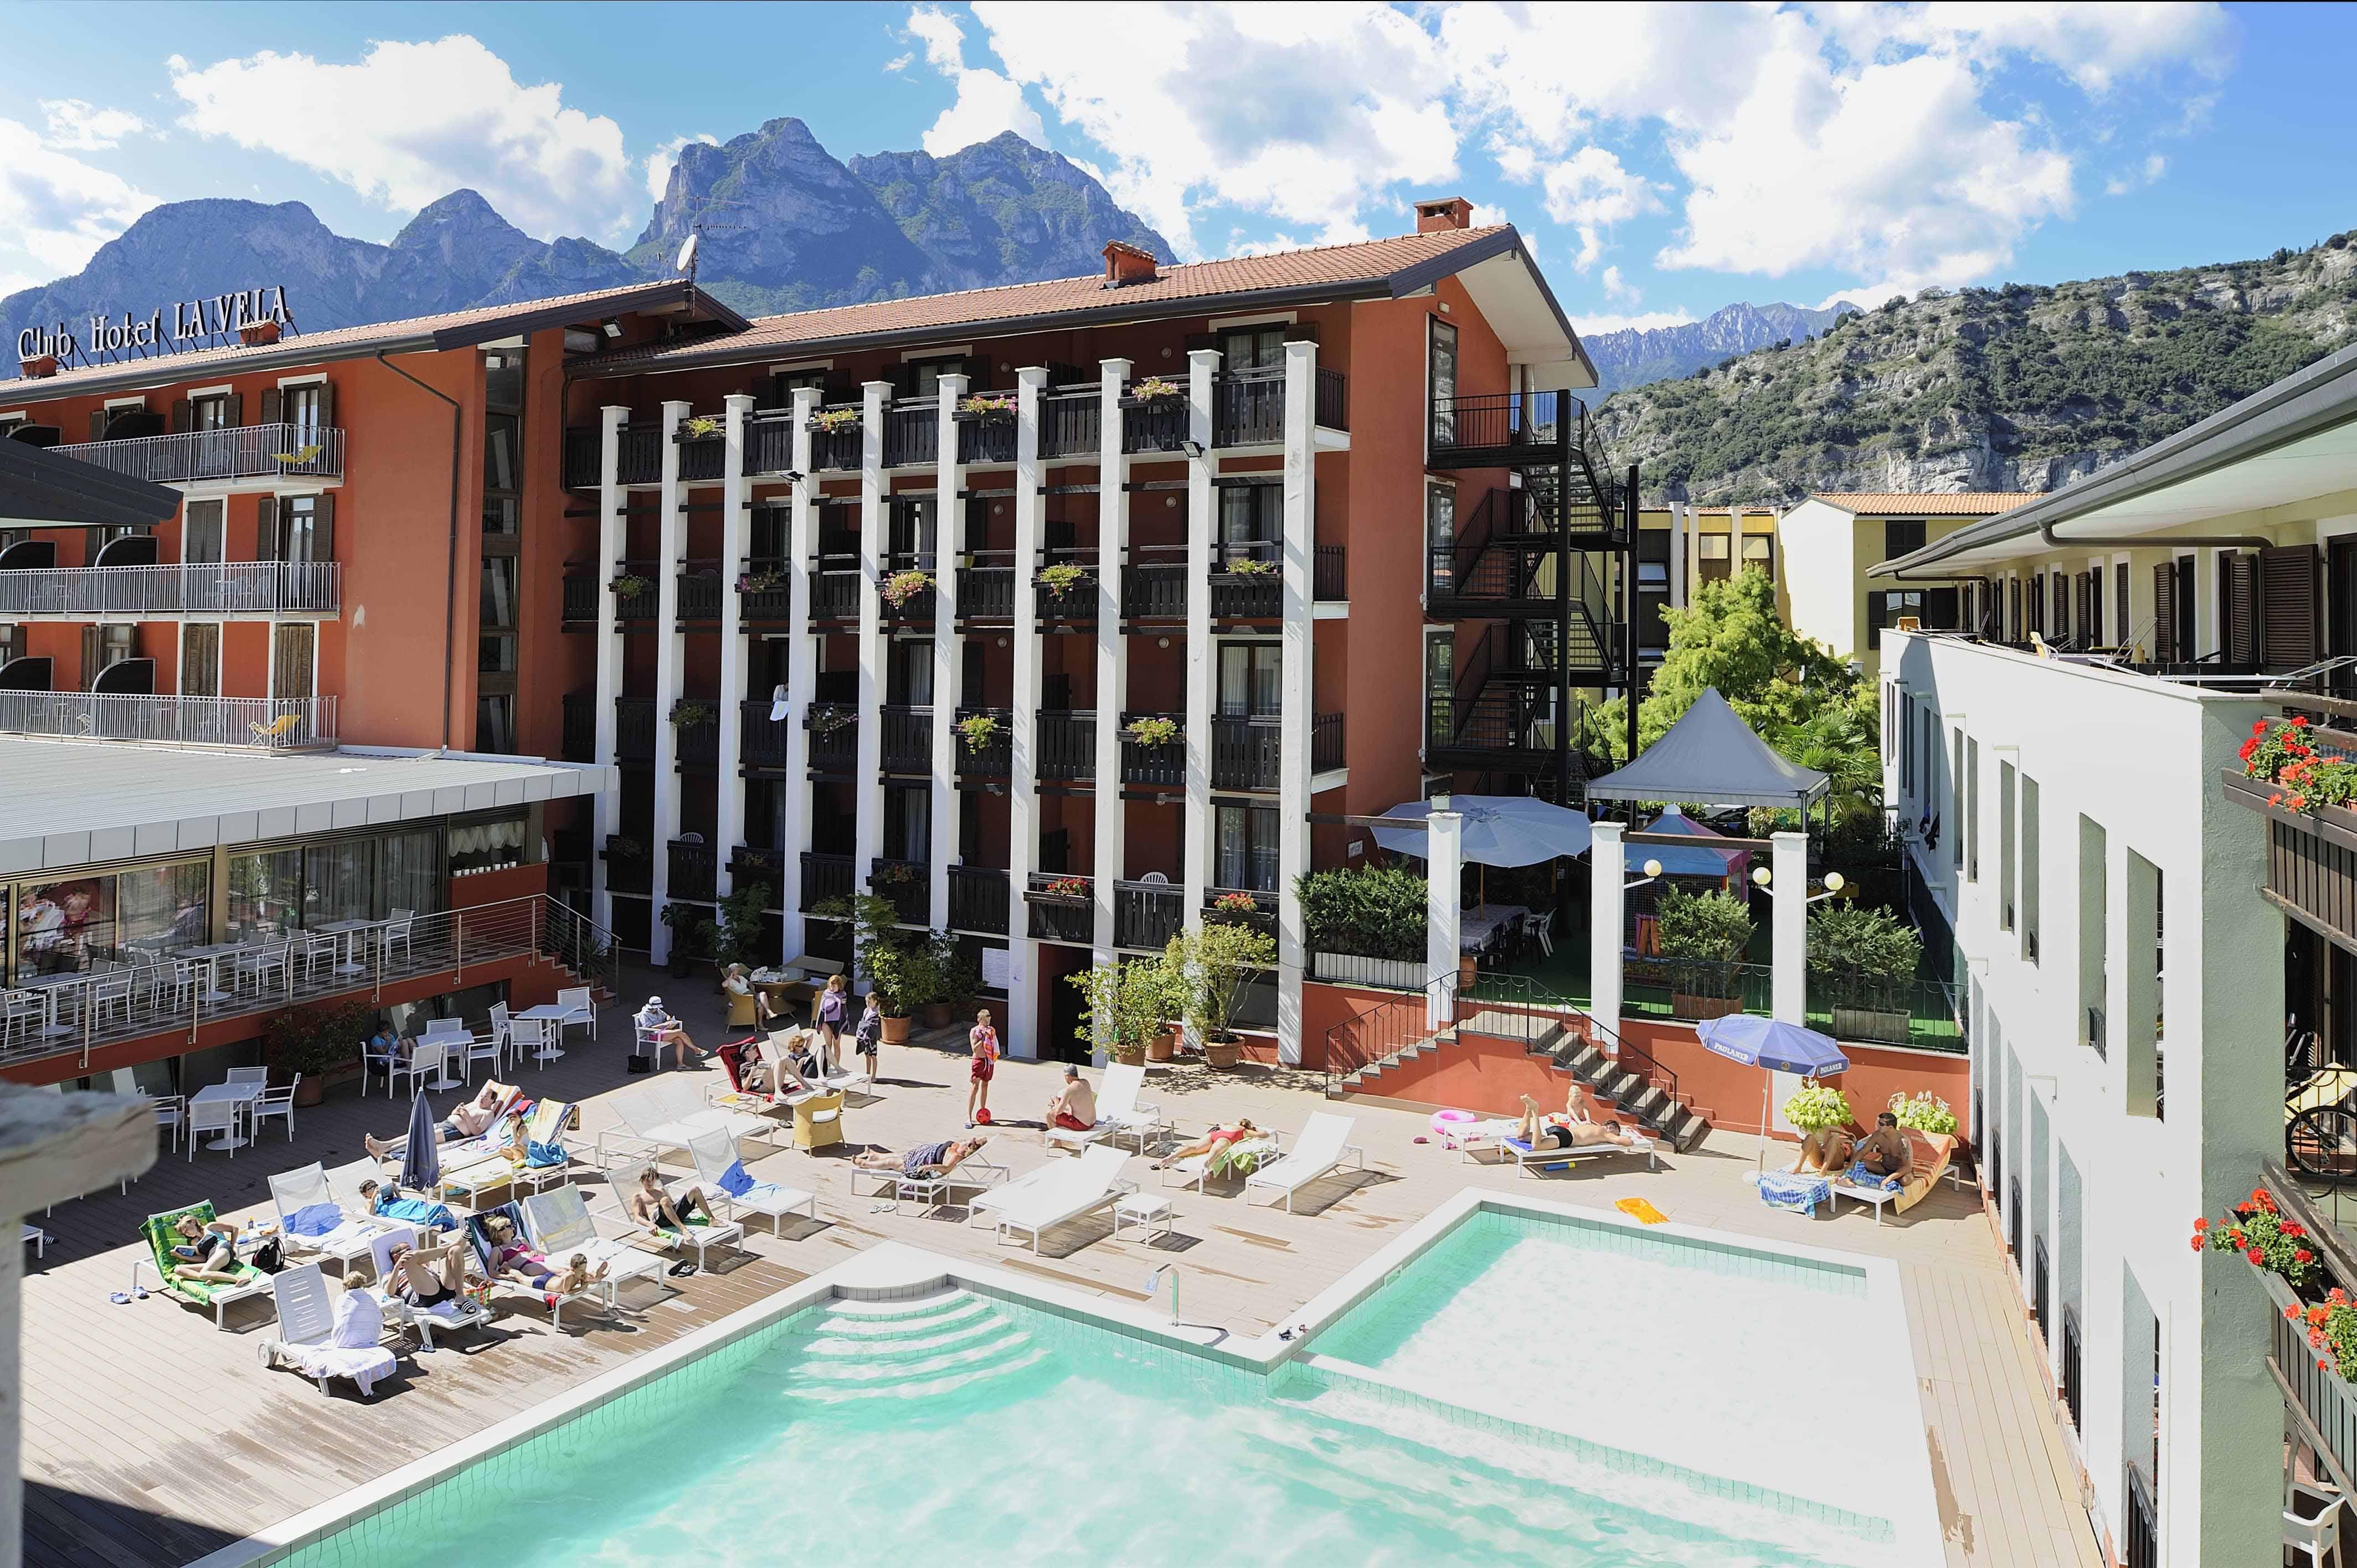 Club Hotel La Vela - Lake Garda